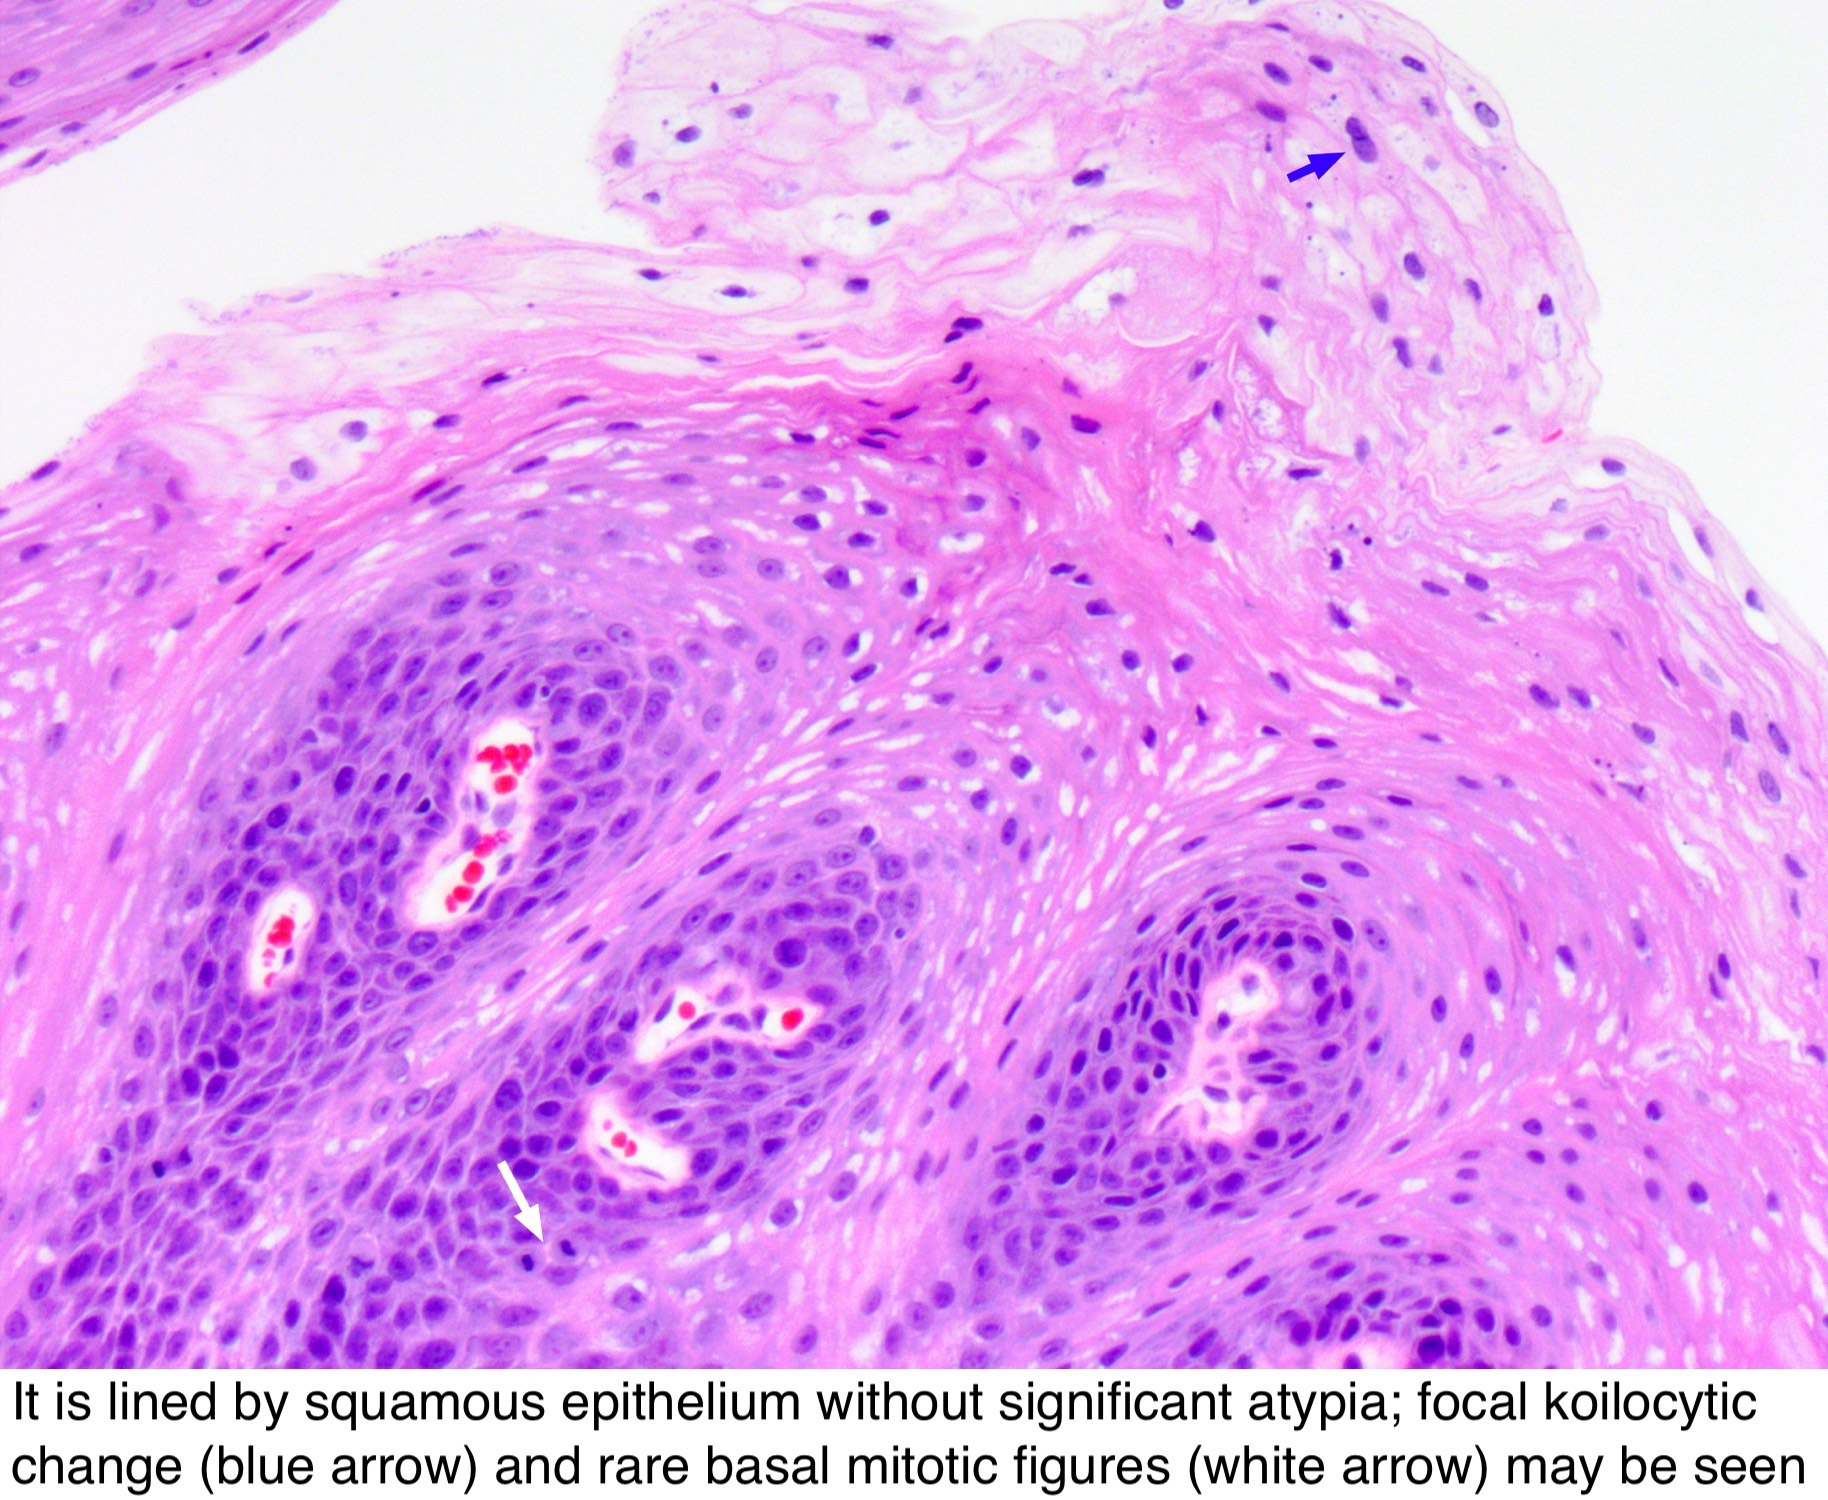 pathology of papillomatosis